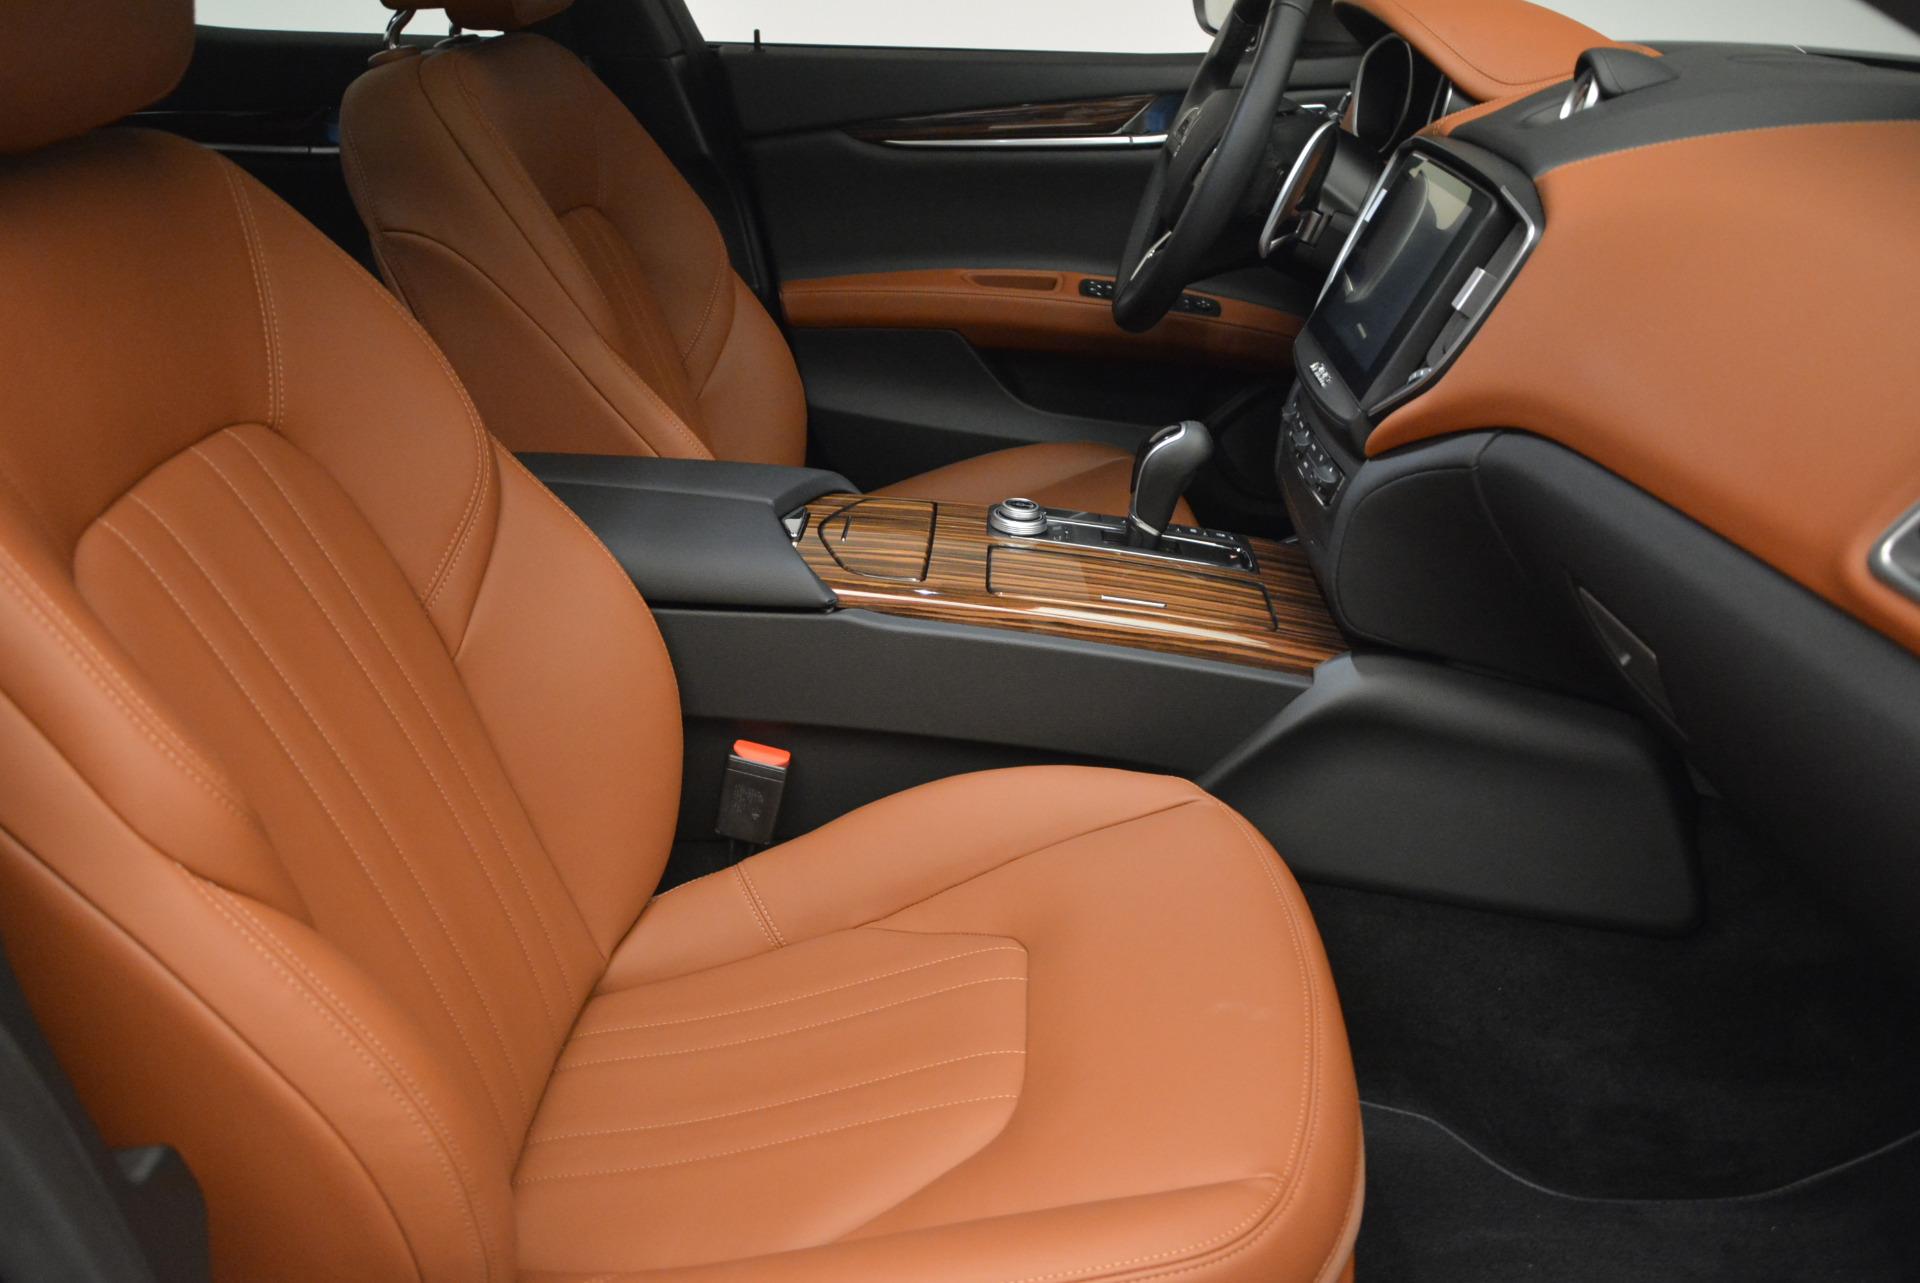 Used 2017 Maserati Ghibli S Q4 - EX Loaner For Sale In Greenwich, CT 568_p20